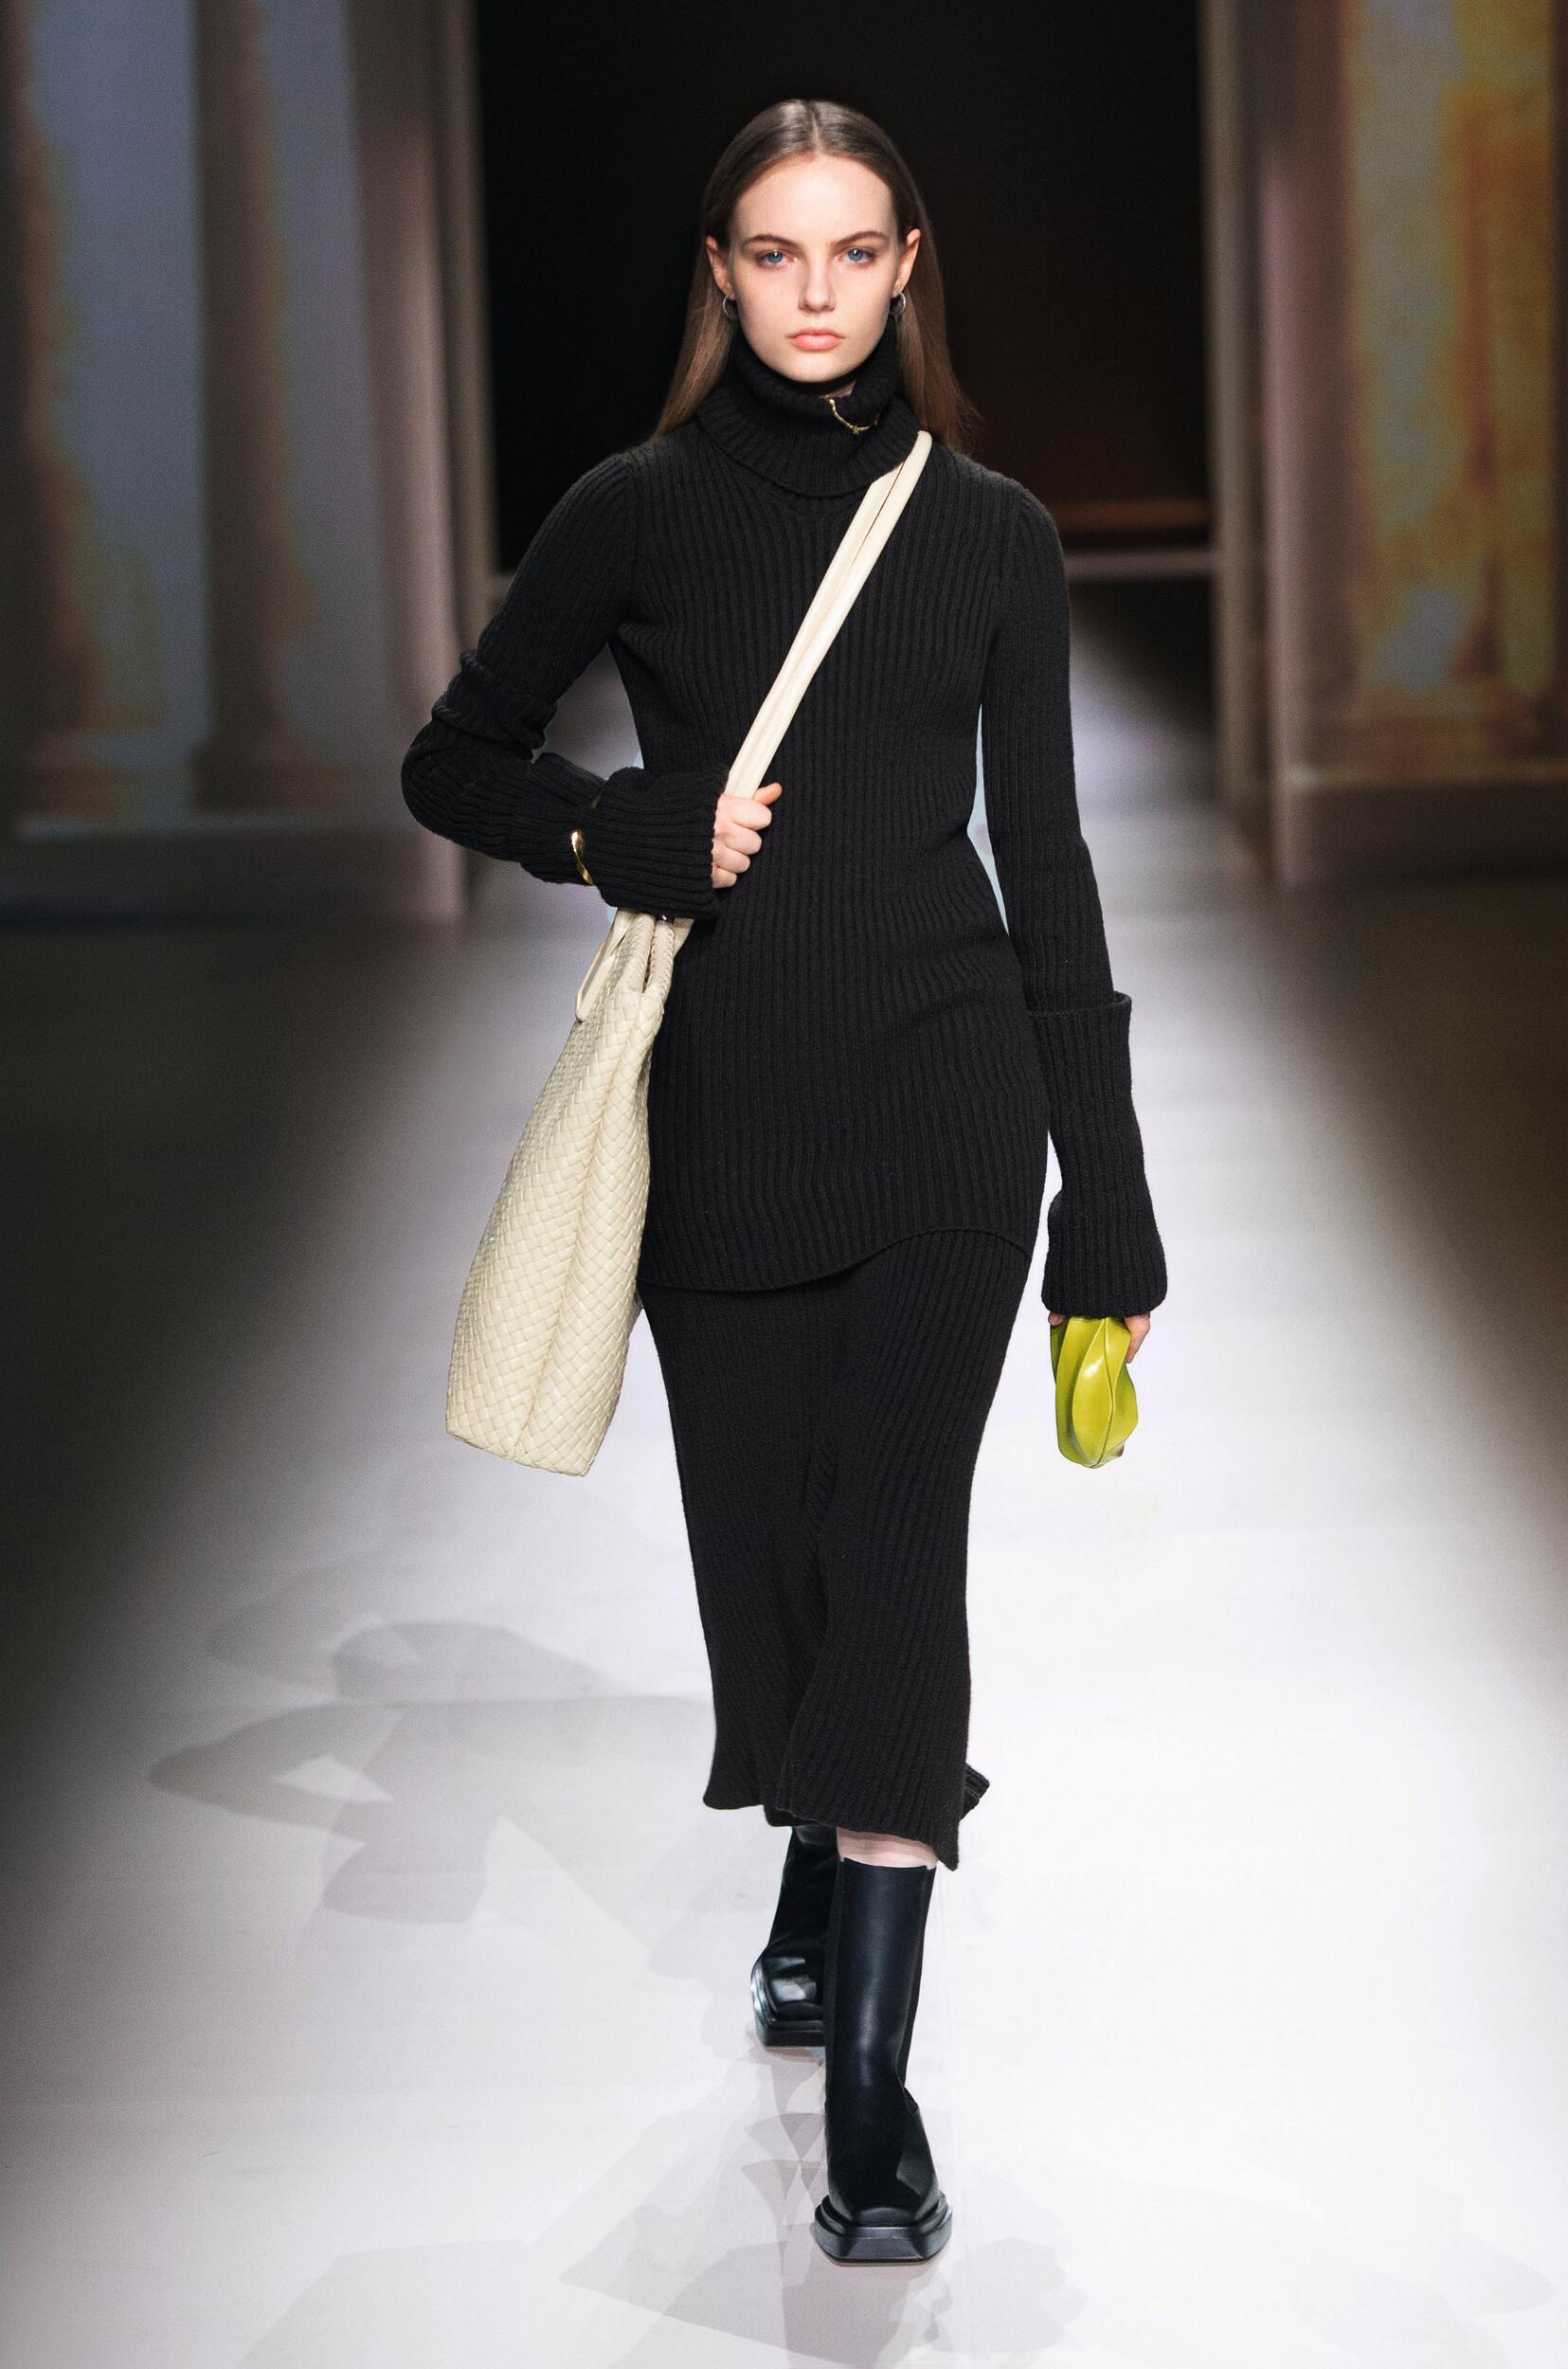 Bottega Veneta Fall Winter 2020 Womens Collection Milan Fashion Week